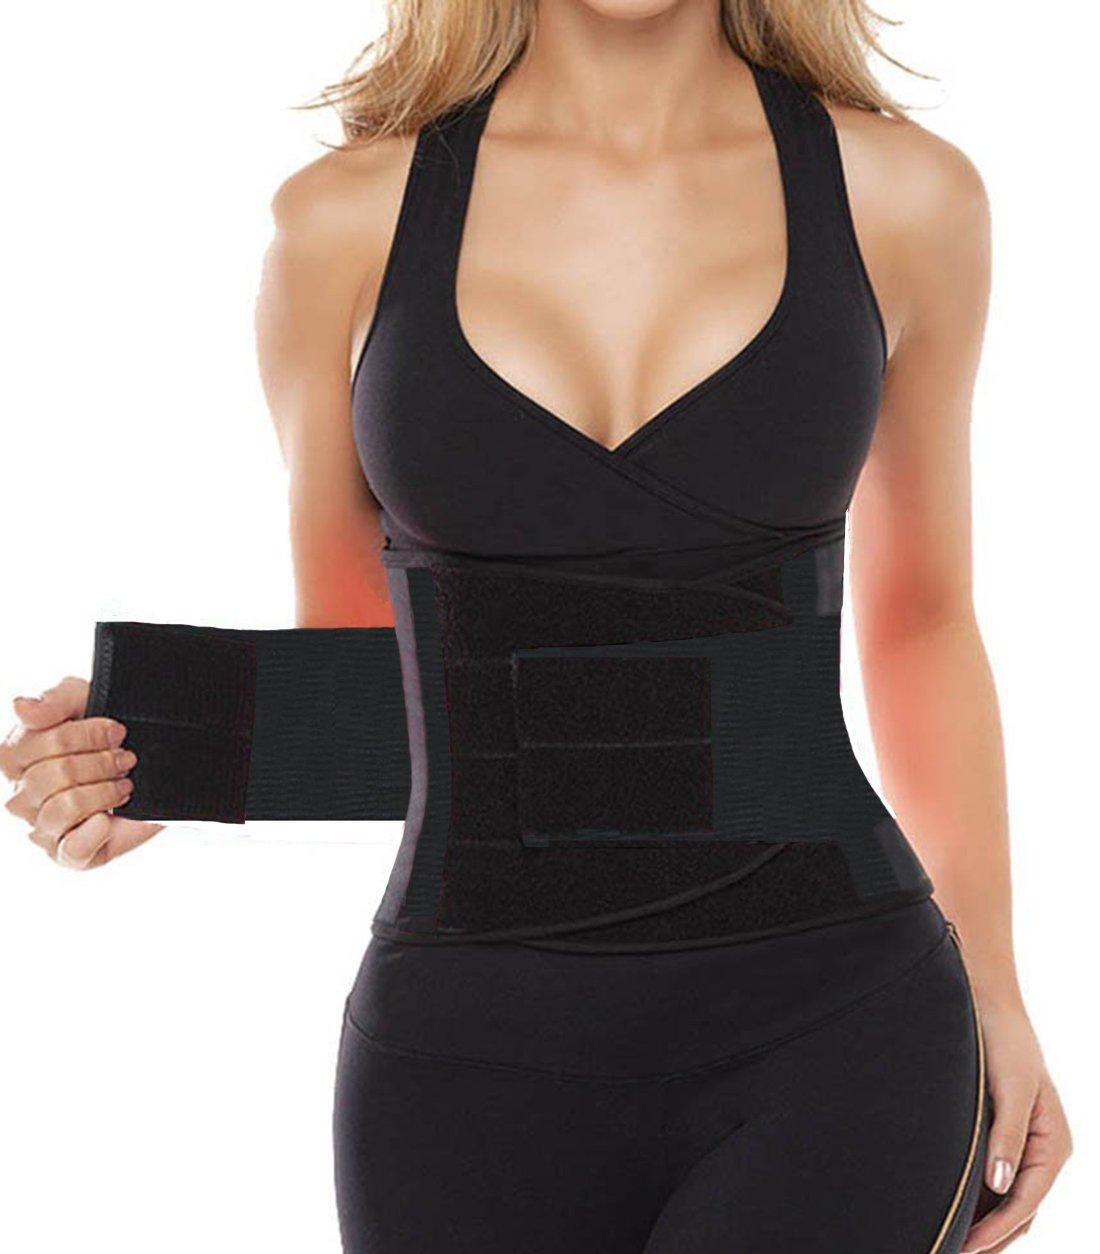 Liangxing Dilanniウエストトリマー重量損失Exerciseエクササイズ機器for ABS Lower Backサポート B07B2S8F52 L (waist:29.6,length:21.3)|ブラック ブラック L (waist:29.6,length:21.3)